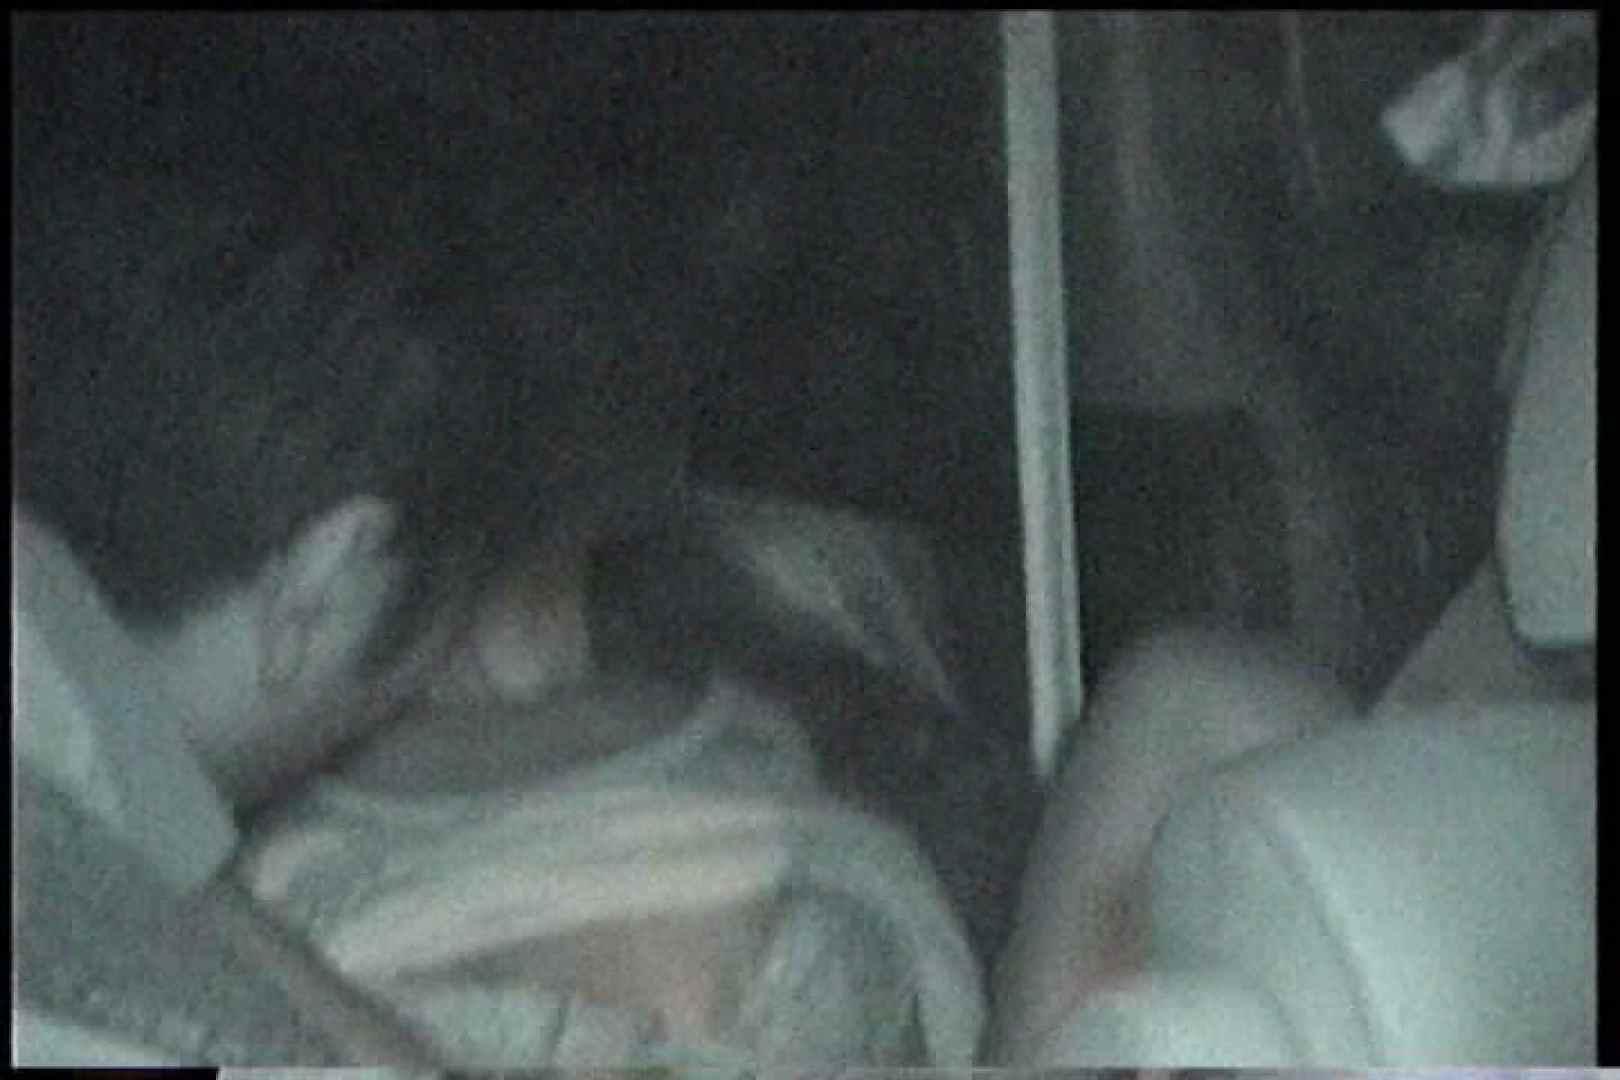 充血監督の深夜の運動会Vol.189 美乳 エロ無料画像 101画像 40